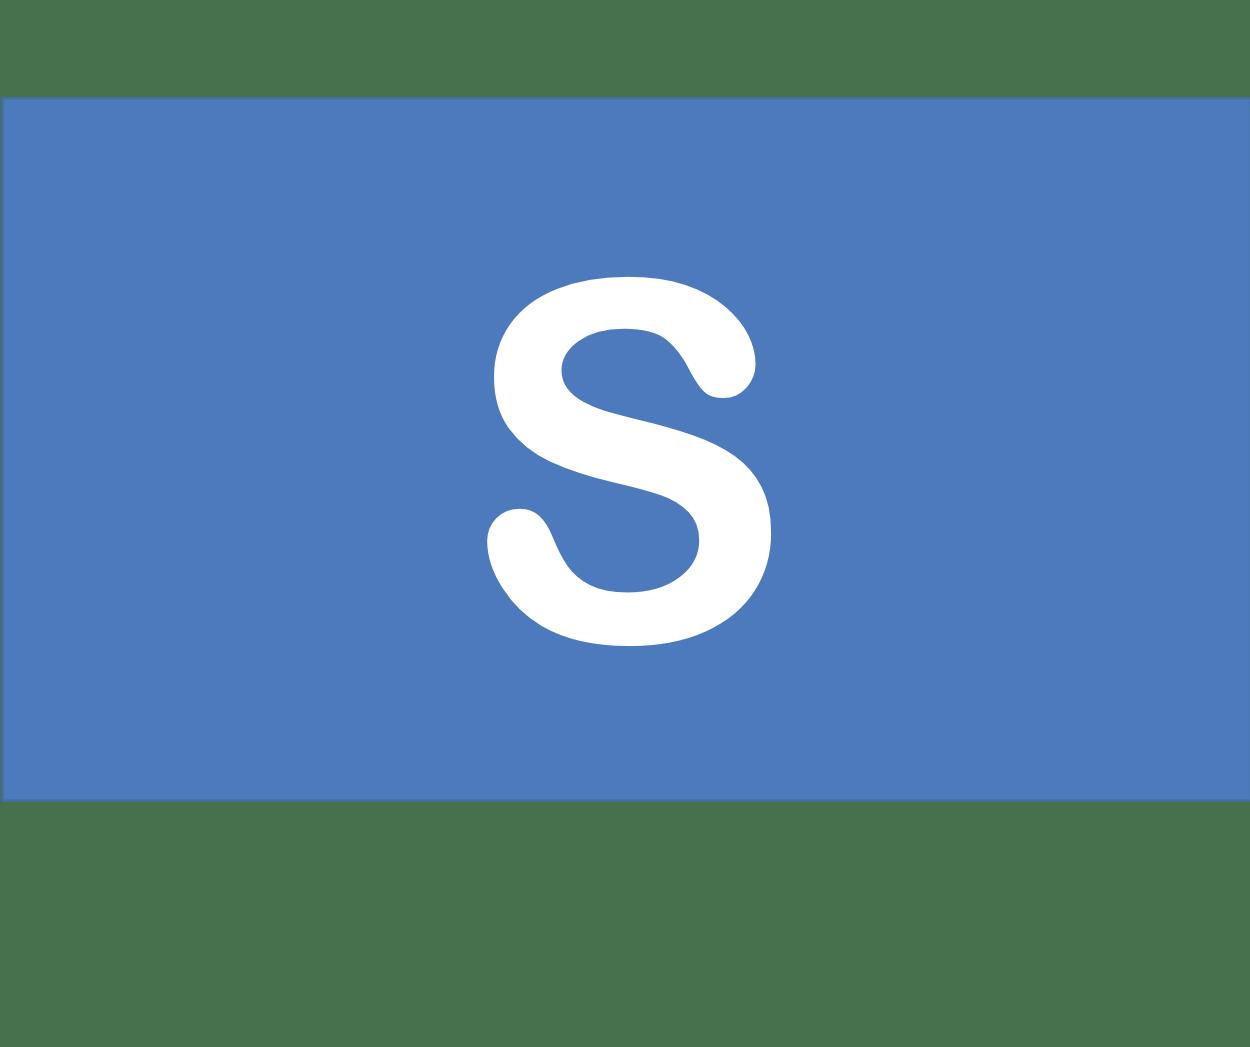 16 S 硫黄 Sulfur 元素 記号 周期表 化学 原子